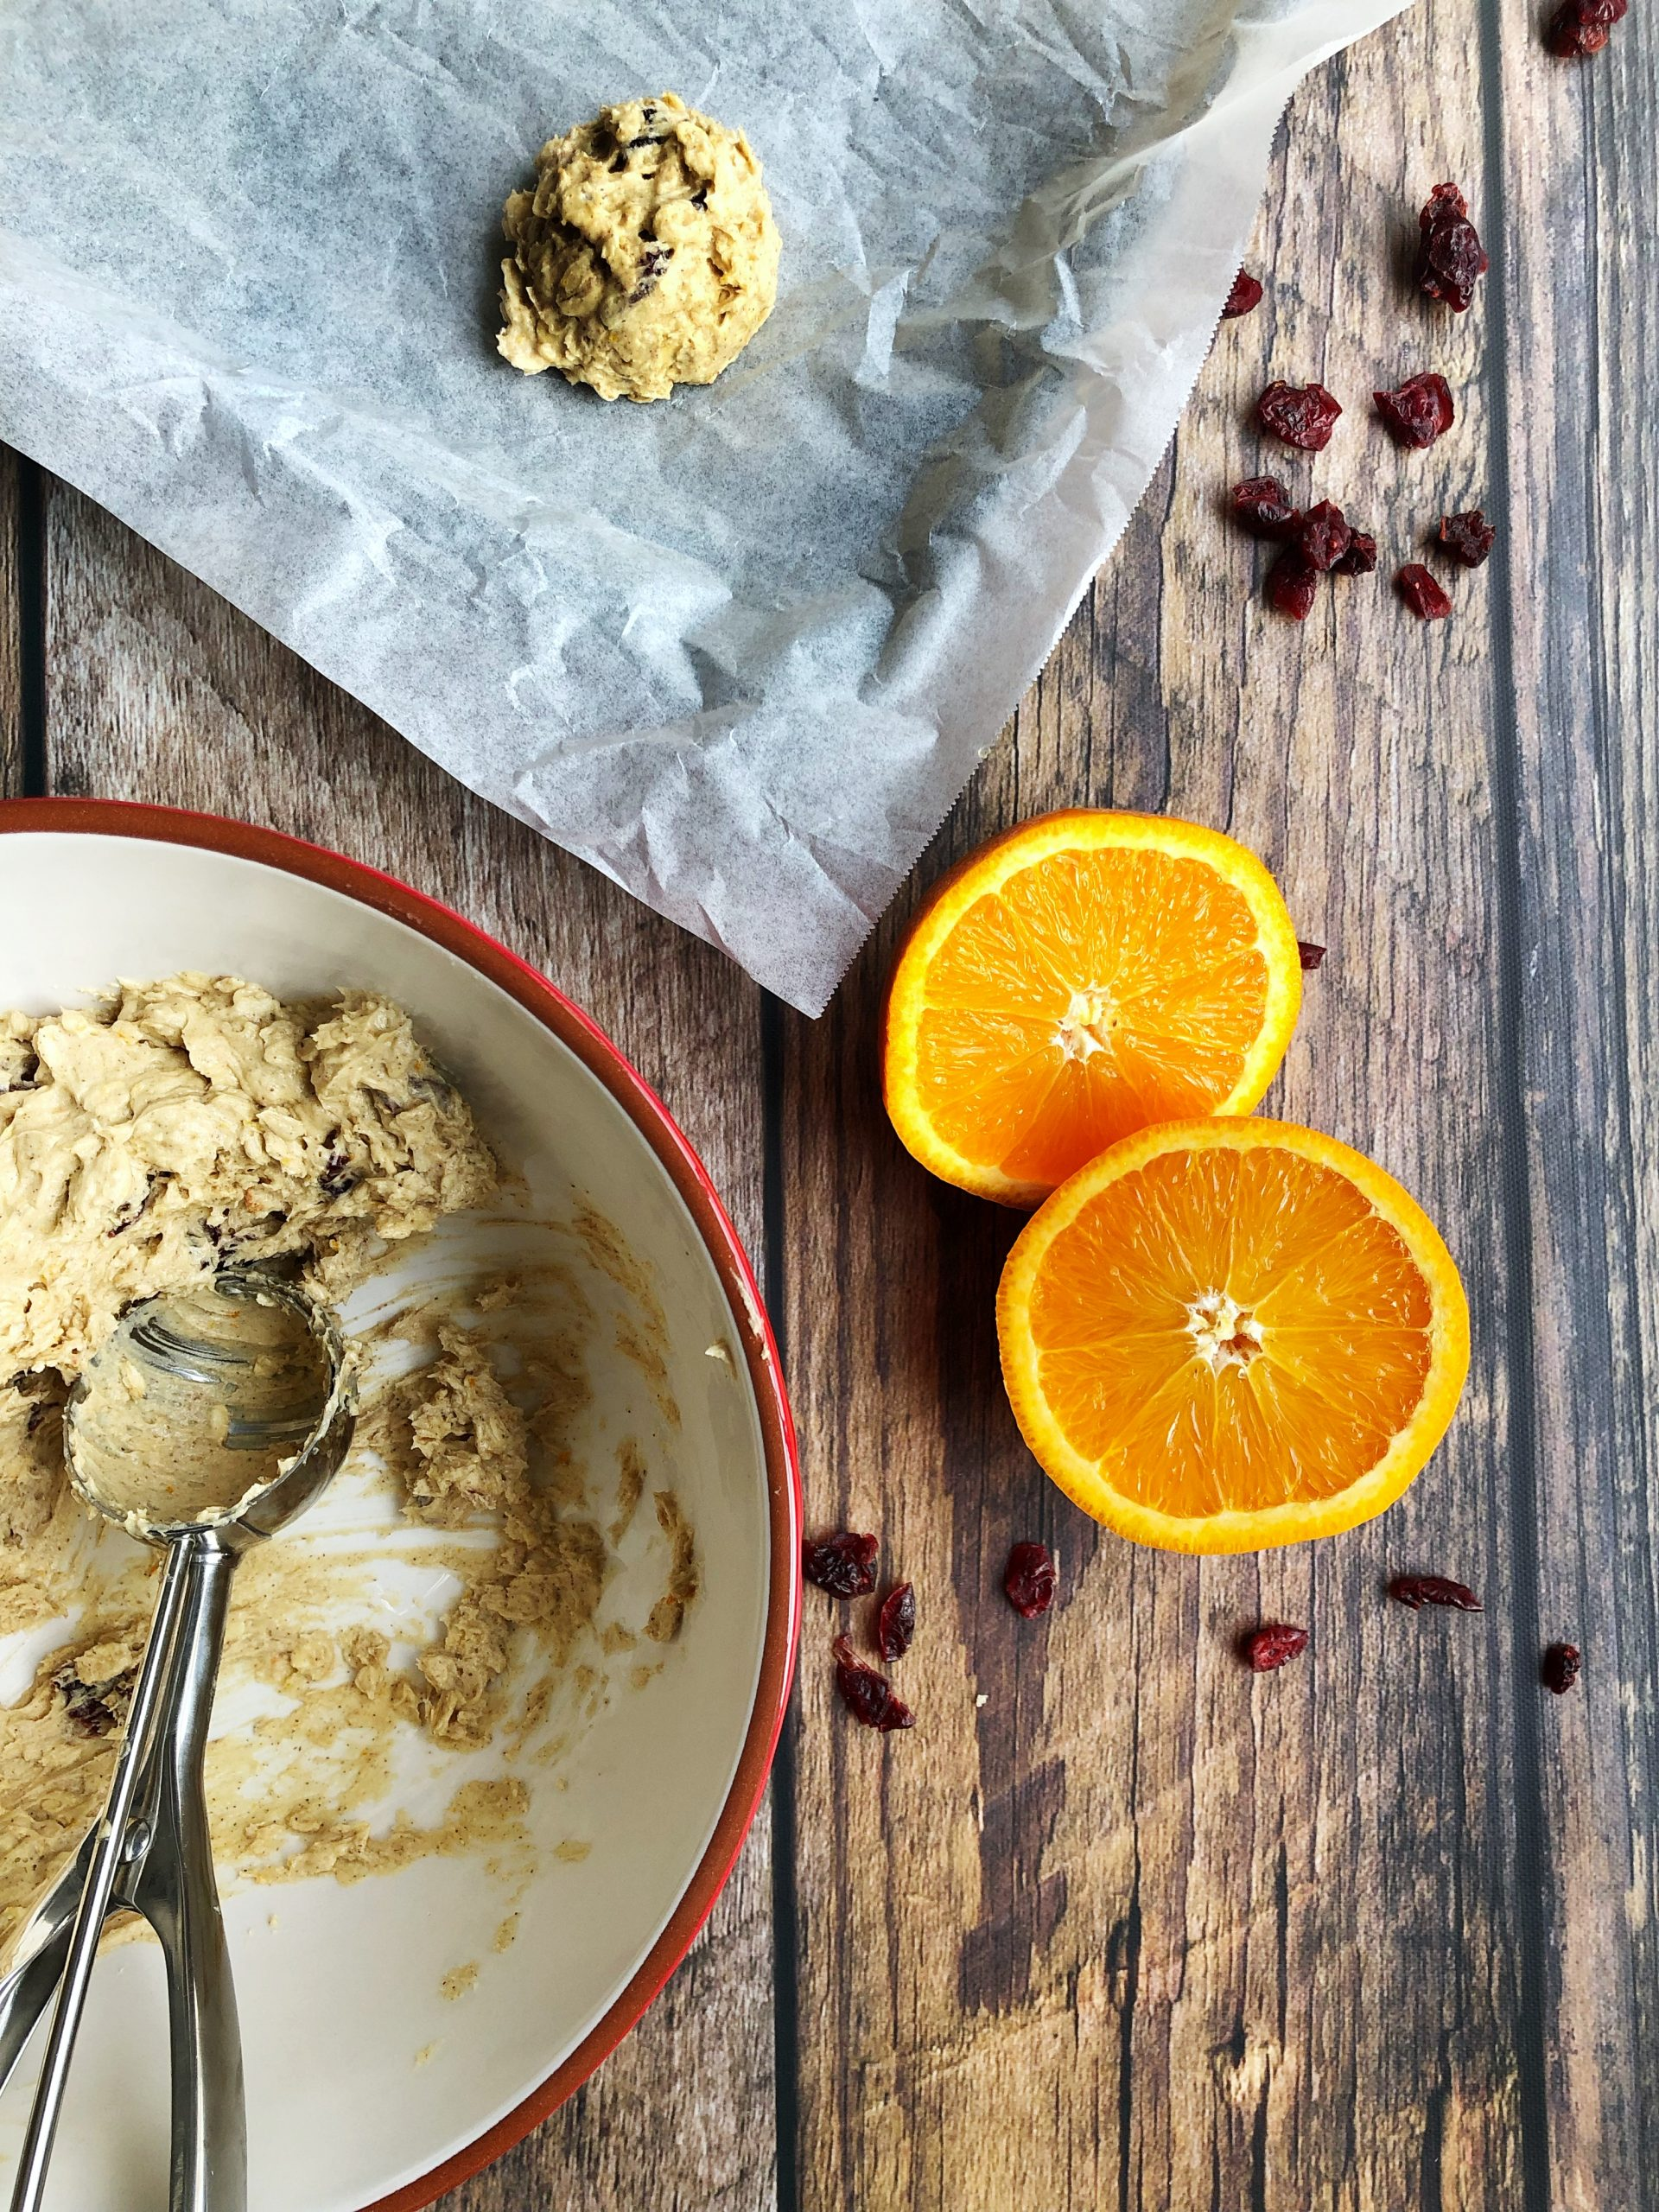 Scooping Oatmeal Cookies with Orange & Cranberries